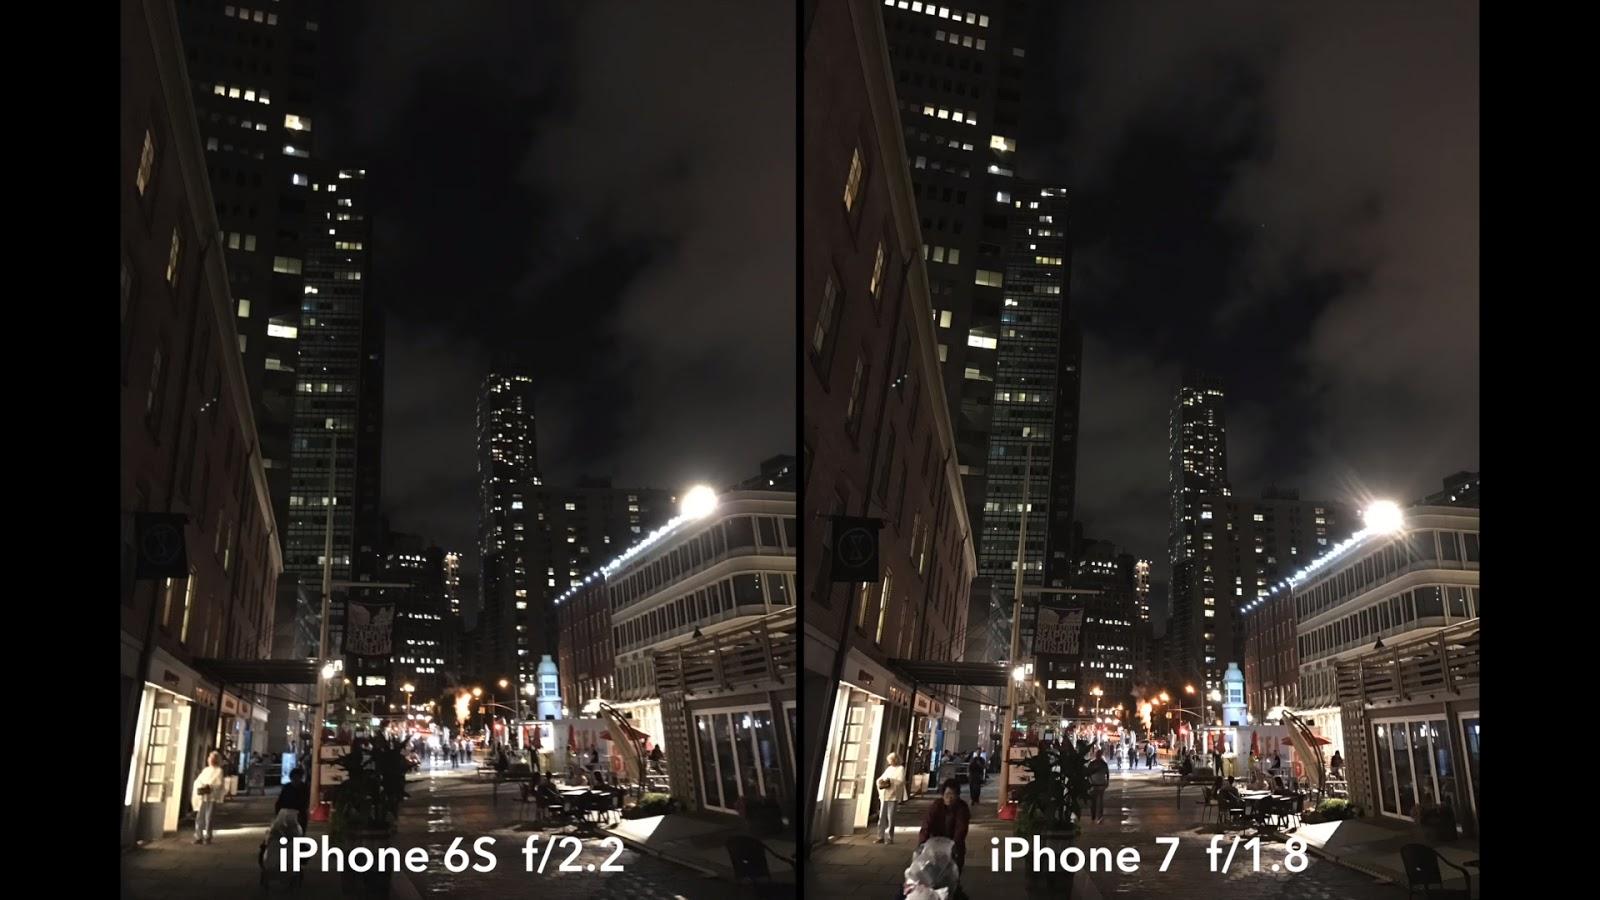 iphone 6s vs iphone 8 camera